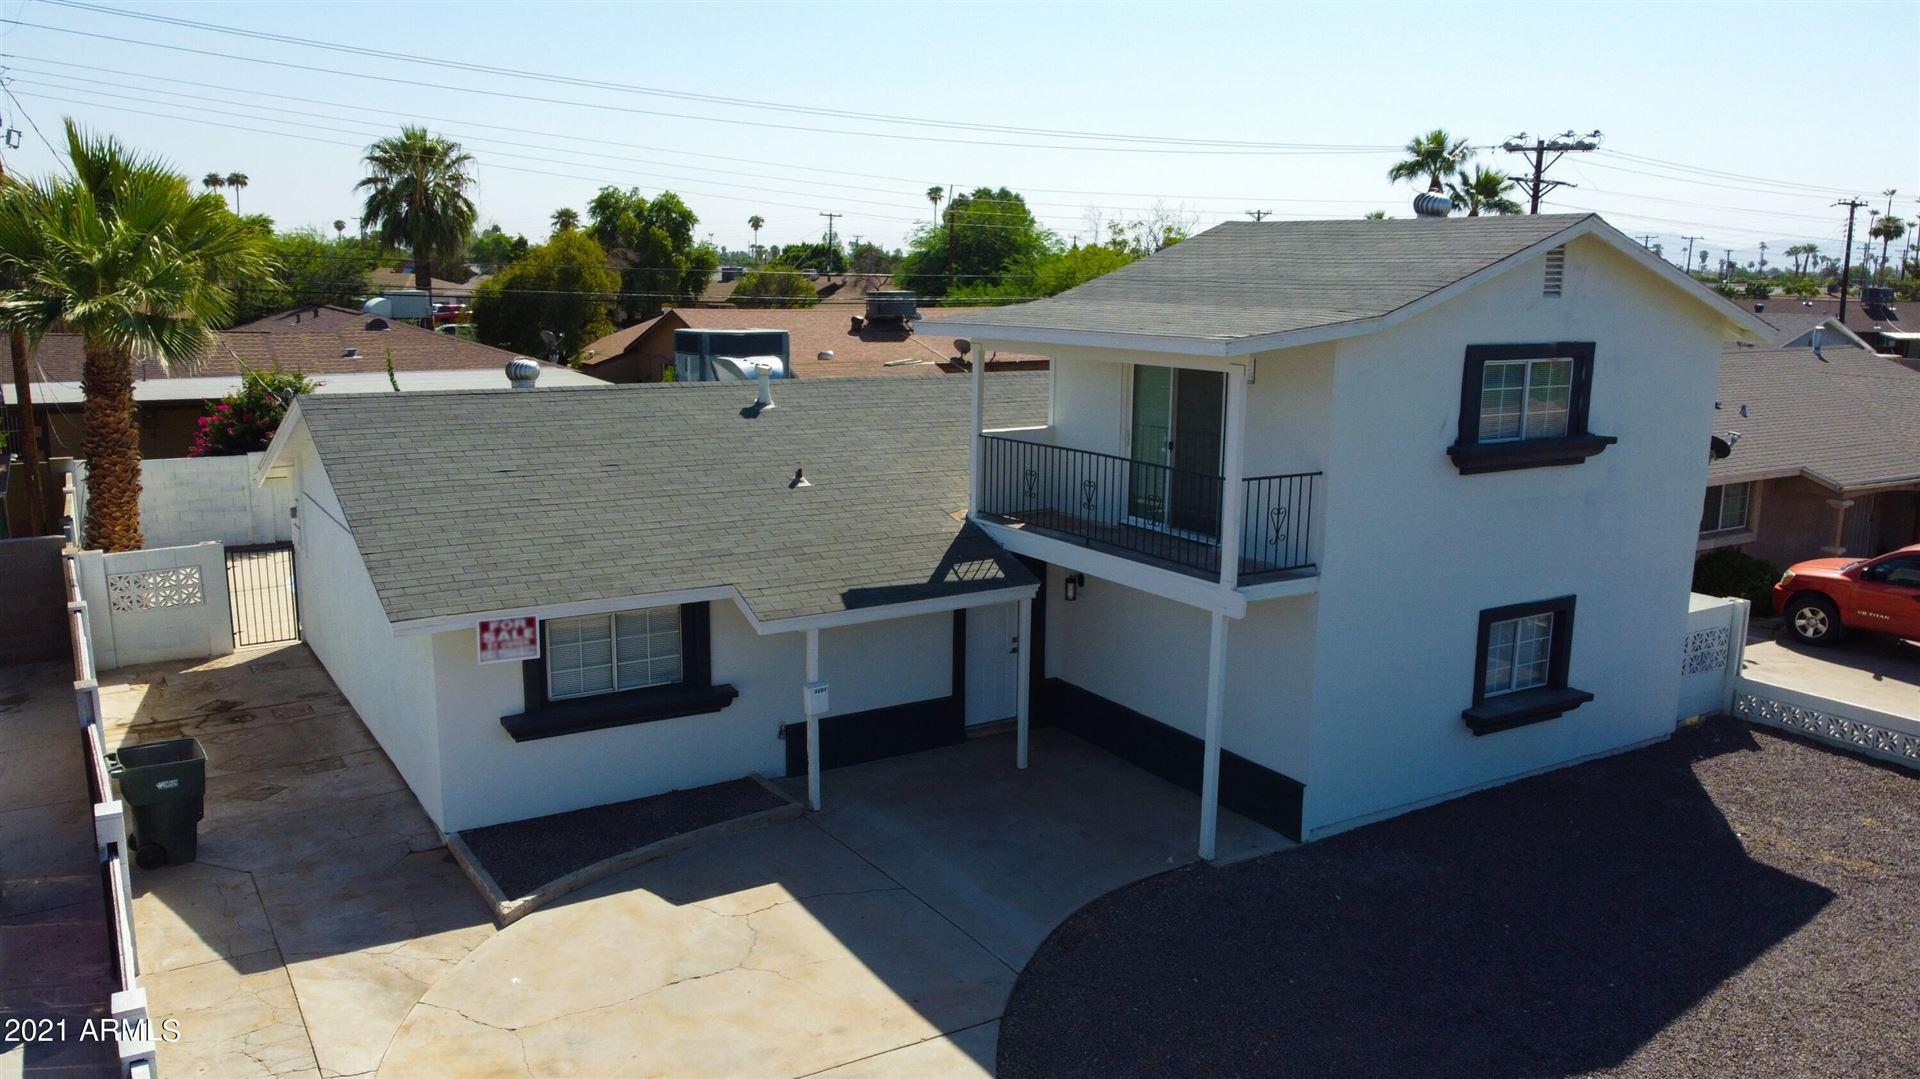 Photo of 3207 N 55th Avenue, Phoenix, AZ 85031 (MLS # 6295910)